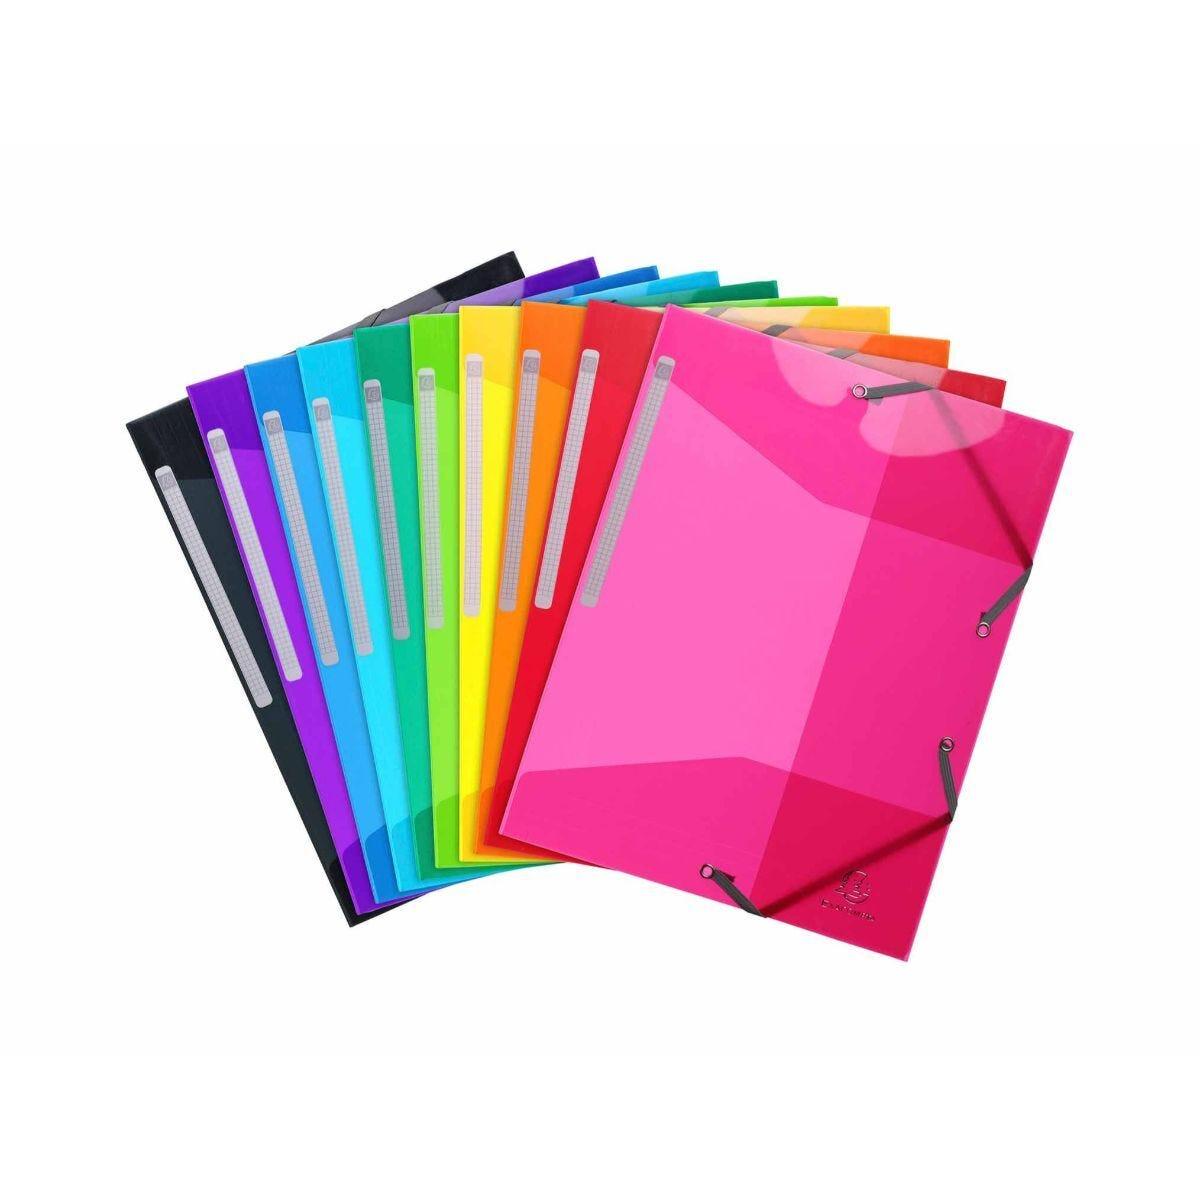 Exacompta Iderama Elastic 3 Flap Folder A4 Pack of 25 Assorted